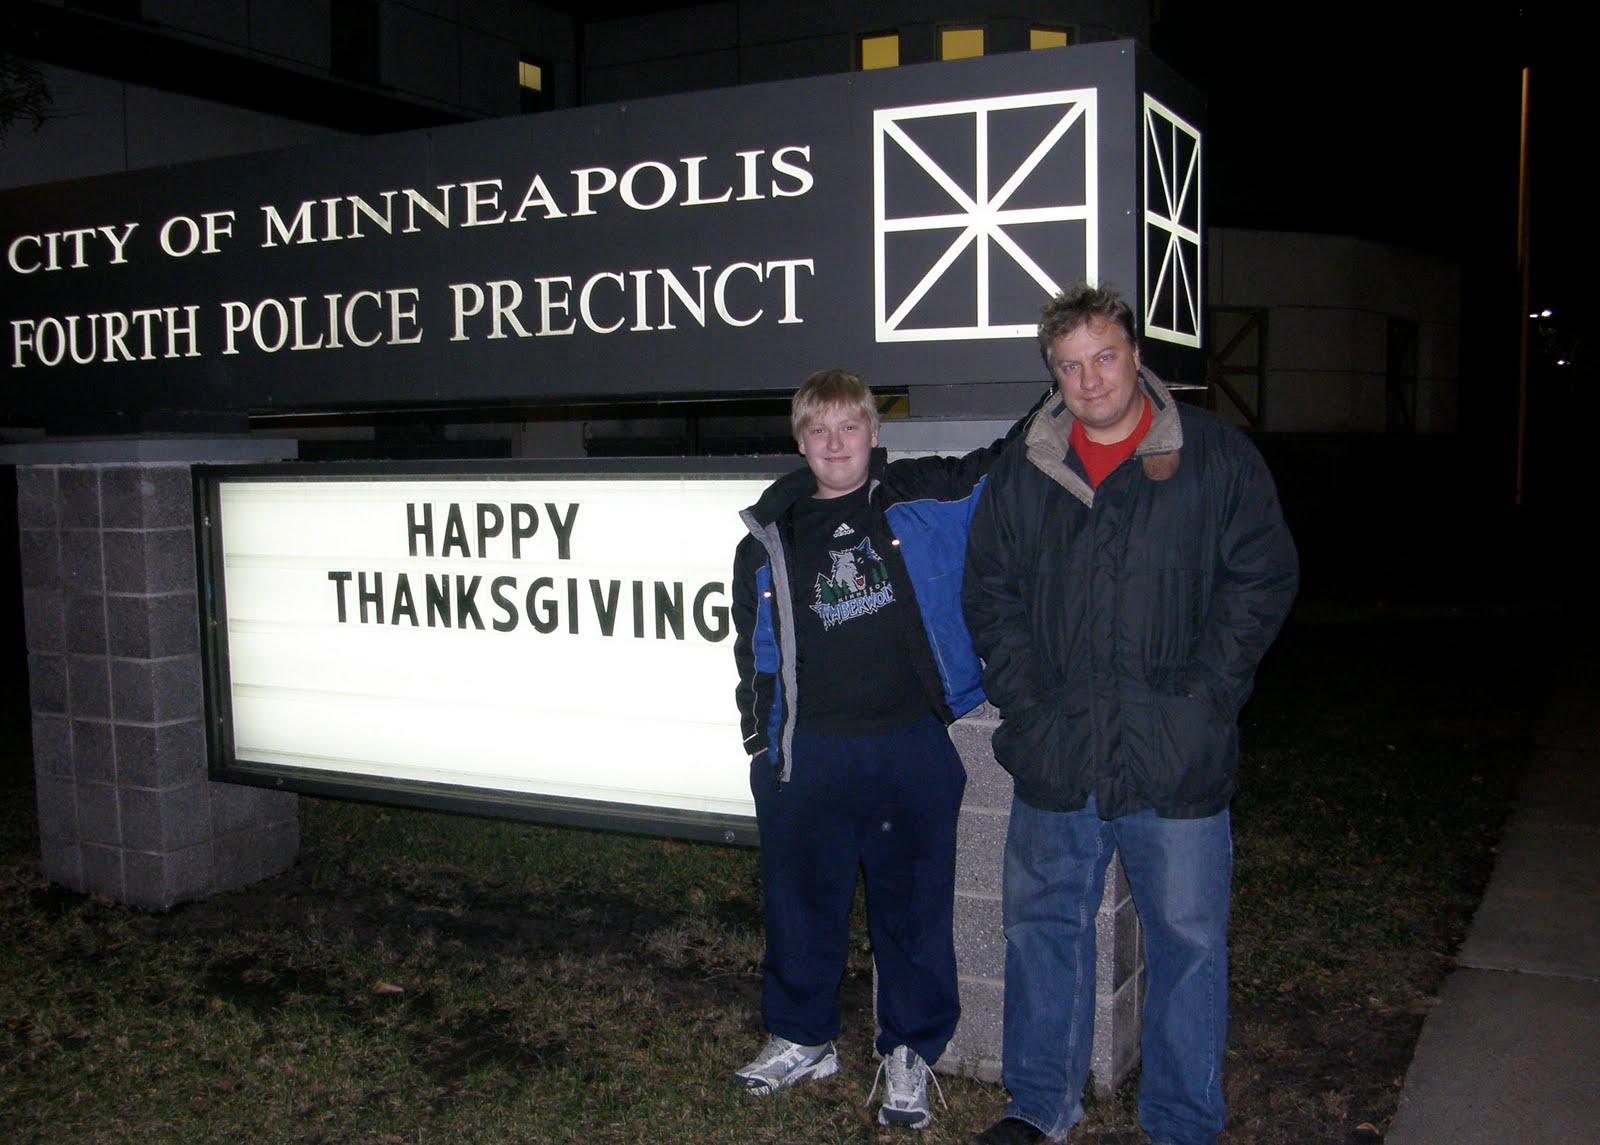 Friday, November 27, 2009